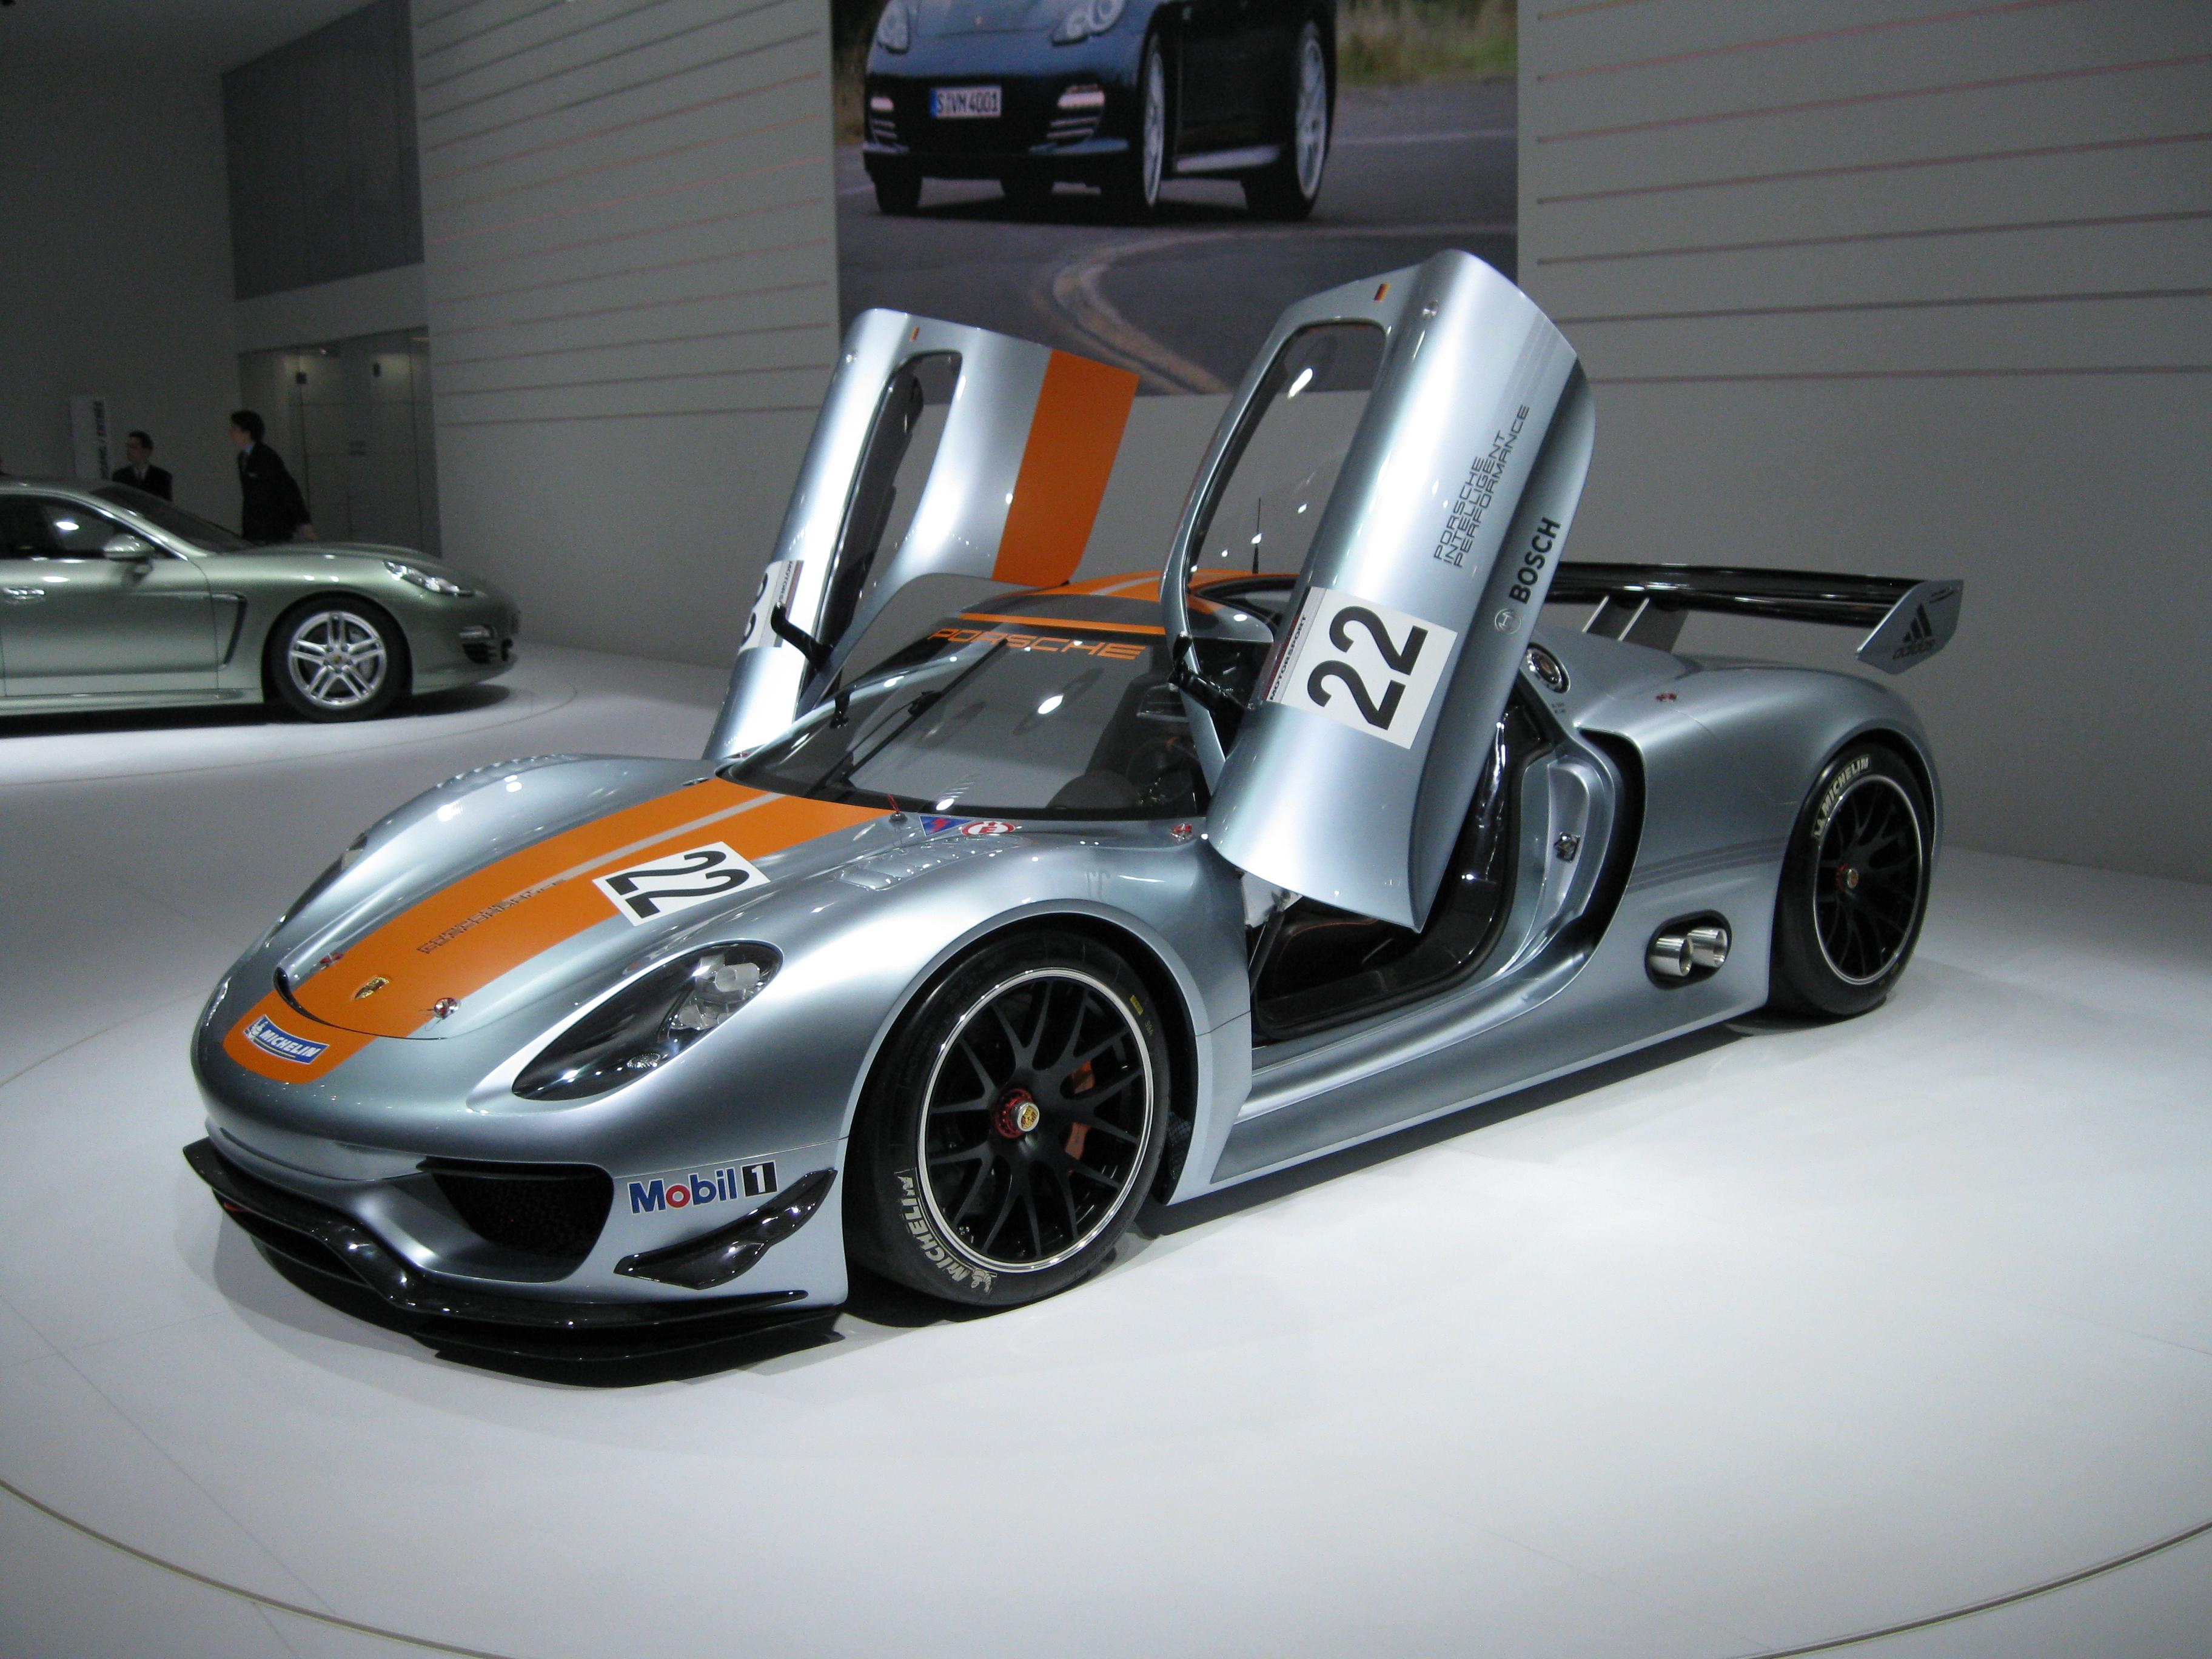 Rsr Race Car Reproductions